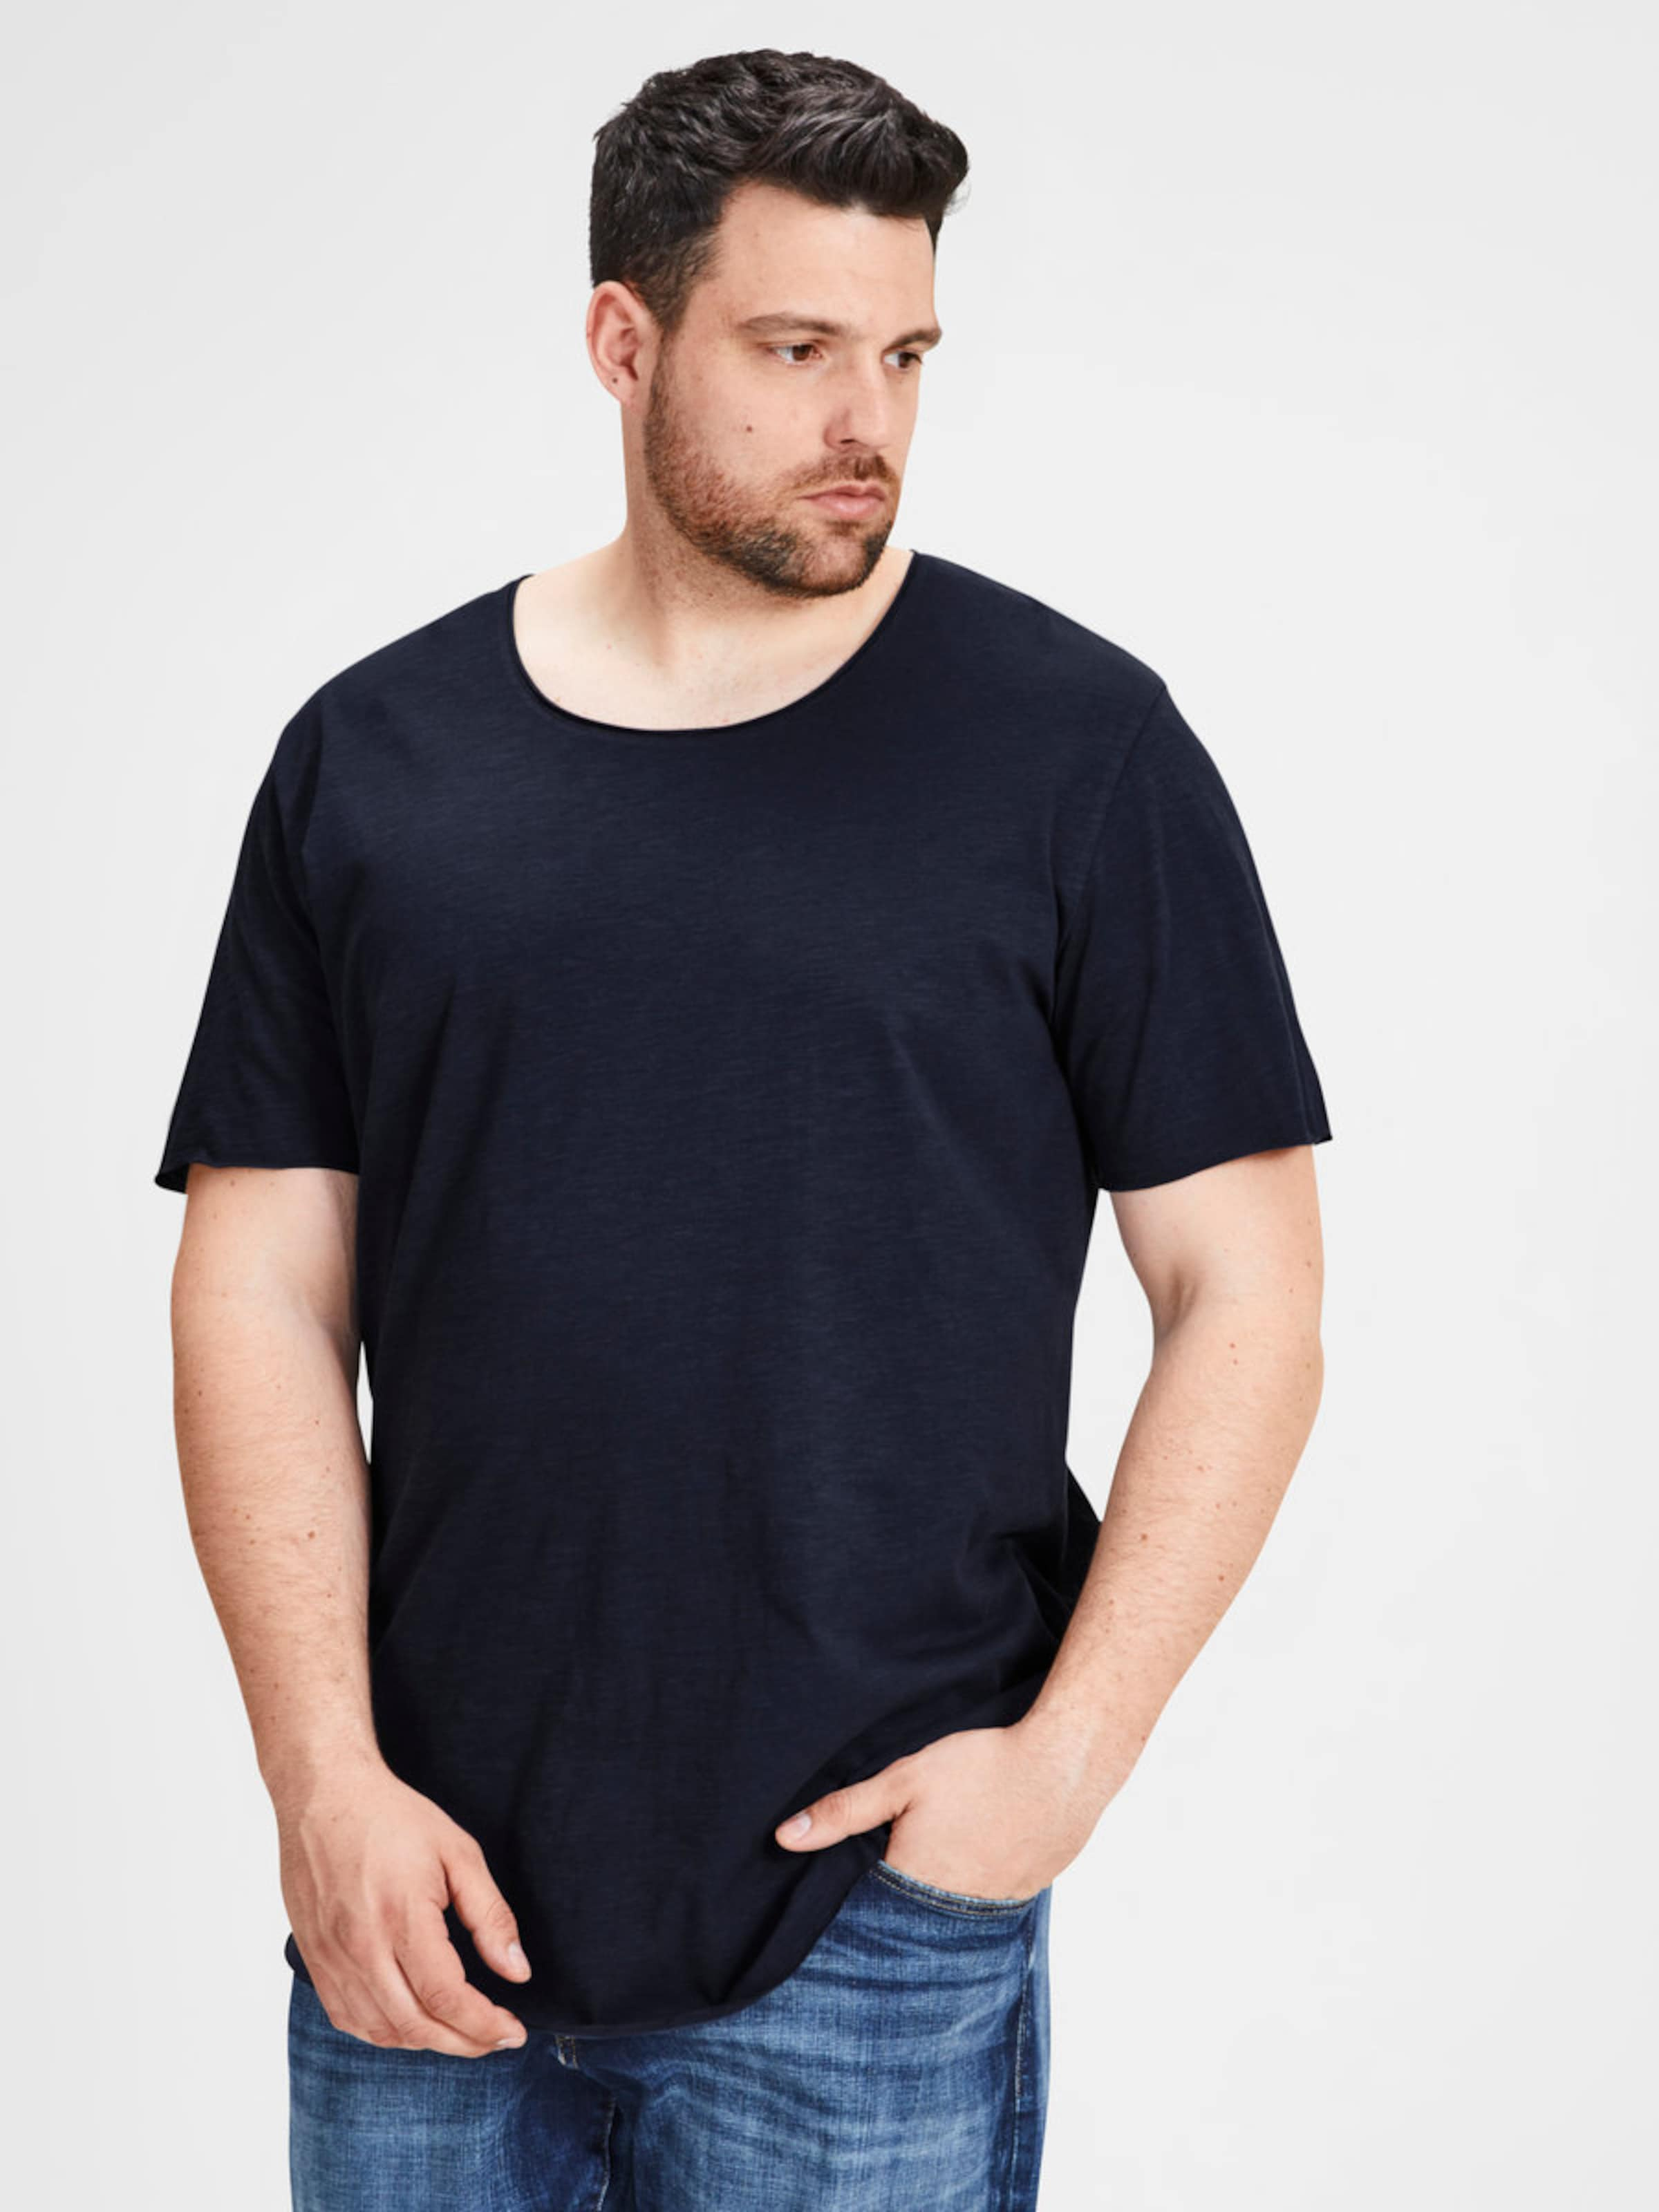 Jackamp; shirt T In Jones Nachtblau WDIYeE9bH2